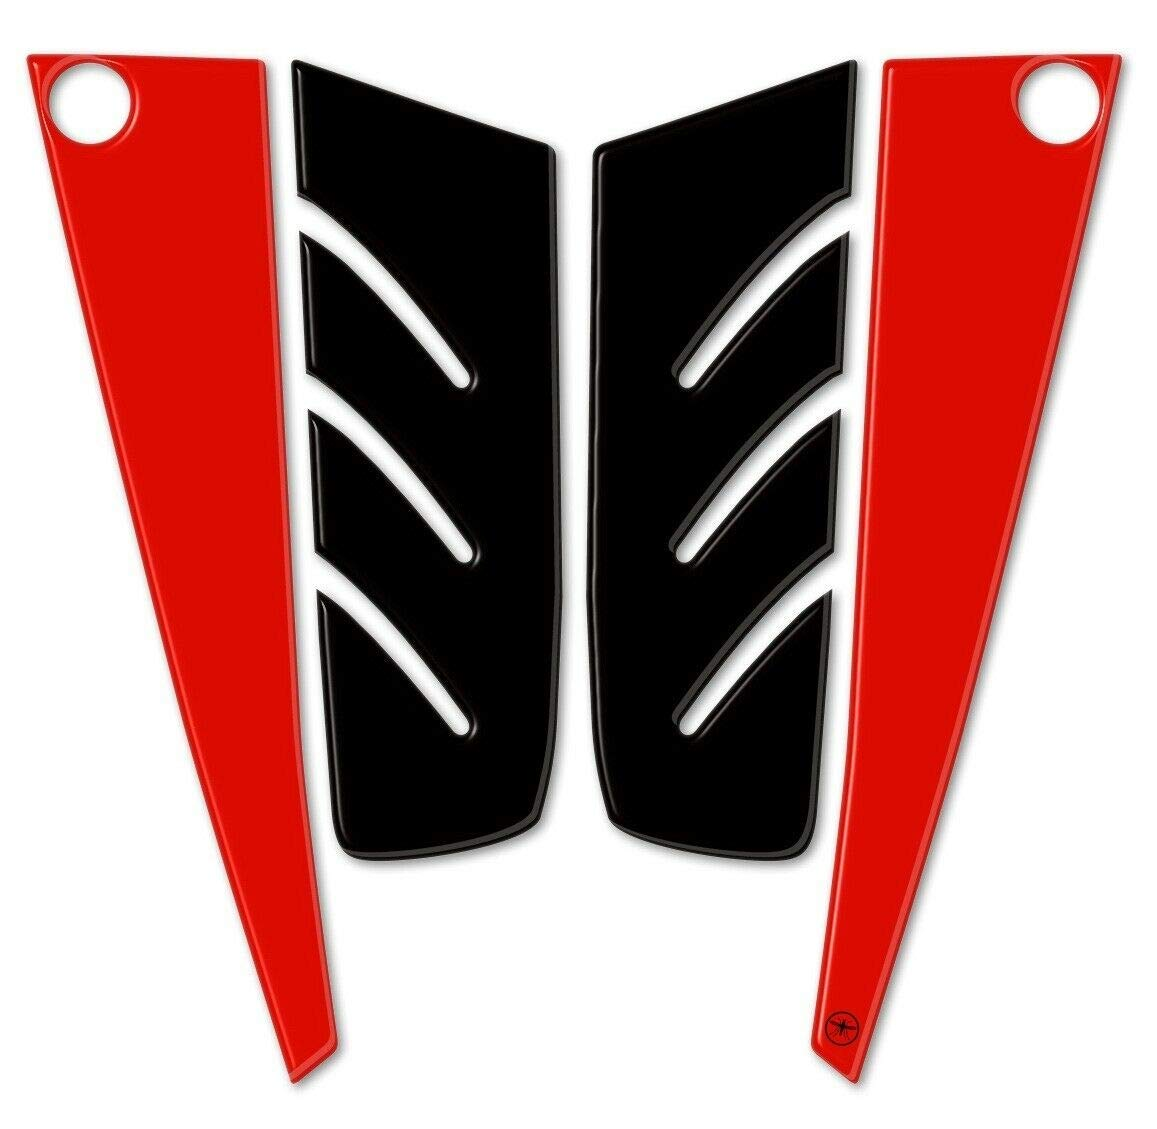 Imitaci/ón Carbono Adhesivo Resina 3D Estribo Delantero Tmax 530 Stickers para Yamaha T MAX 2012-16